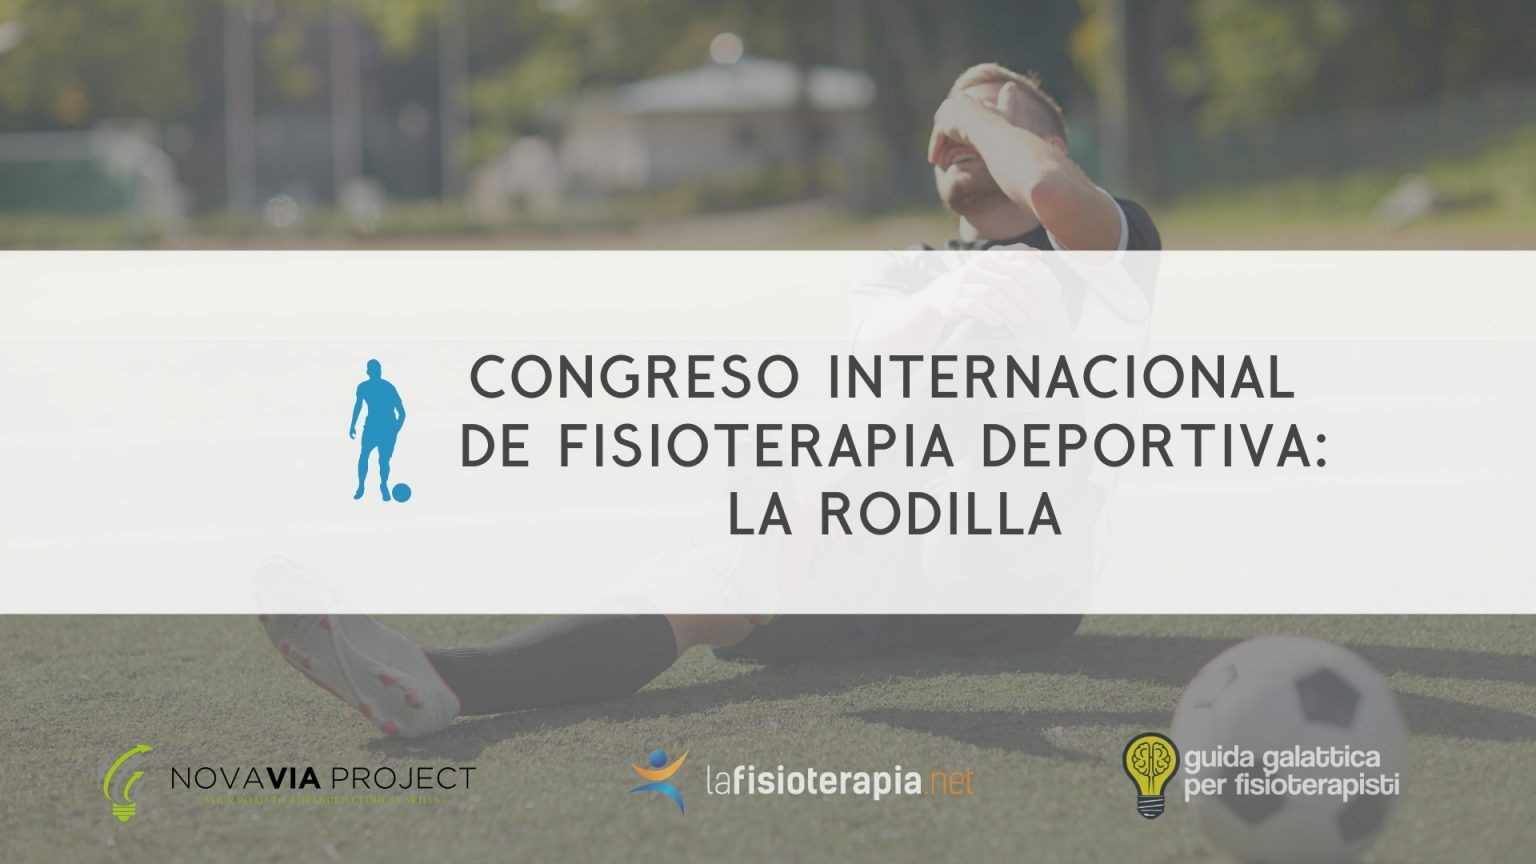 congreso-internacional-rodilla